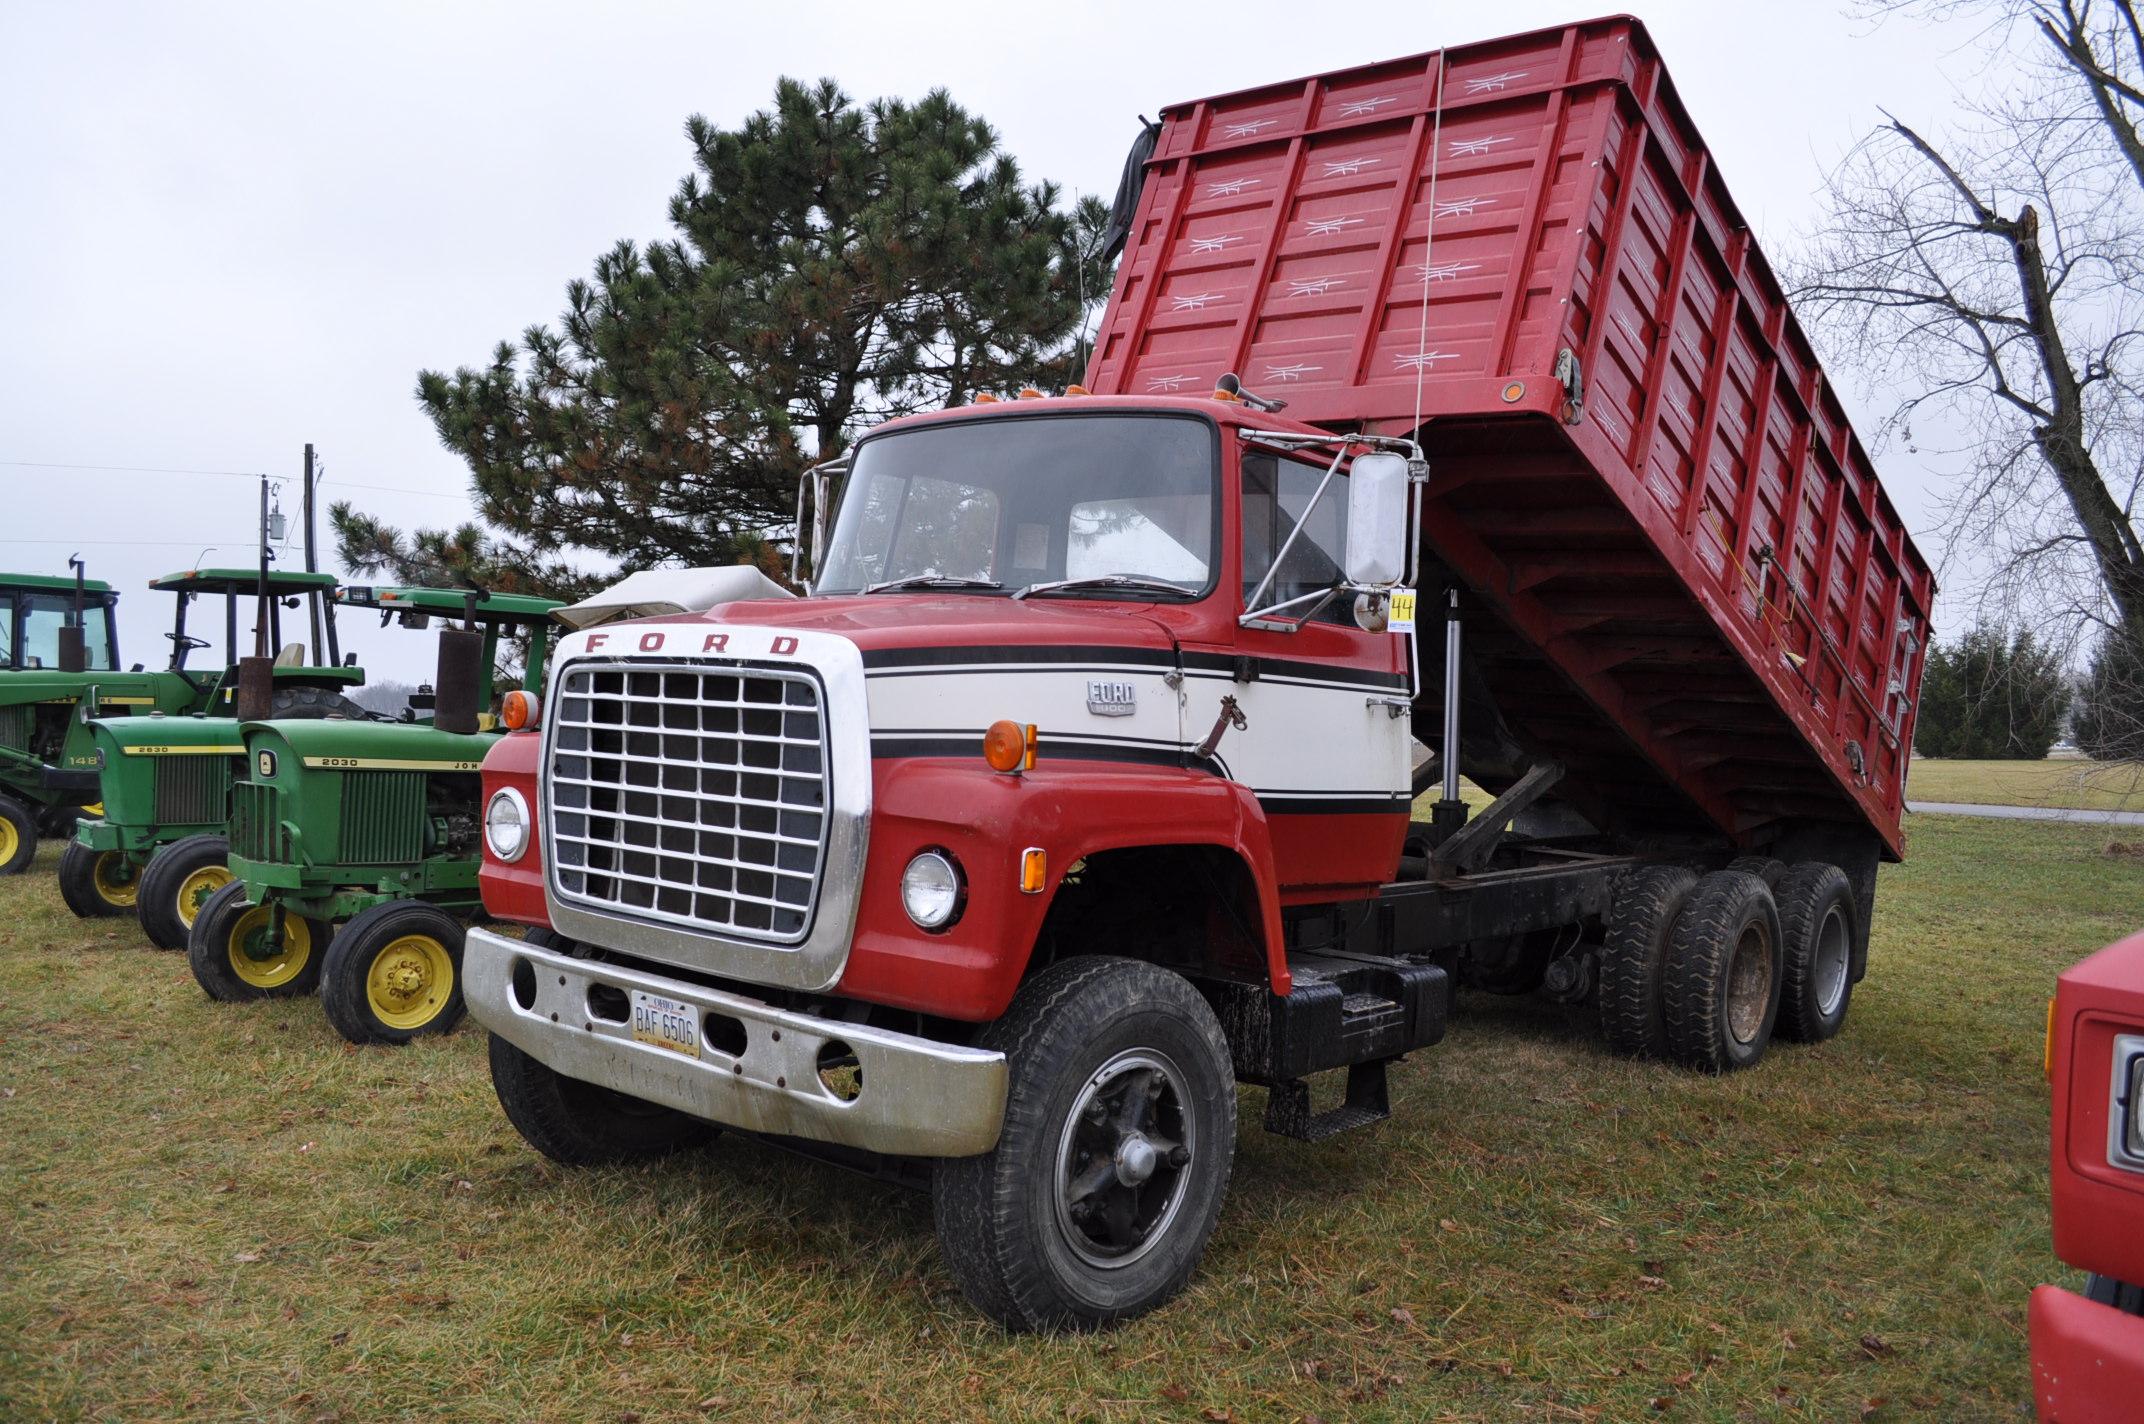 1974 Ford 900 grain truck, tandem axle, gas V-8, 5 + 2, 10.00-20 tires, 18' wood floor, pto,